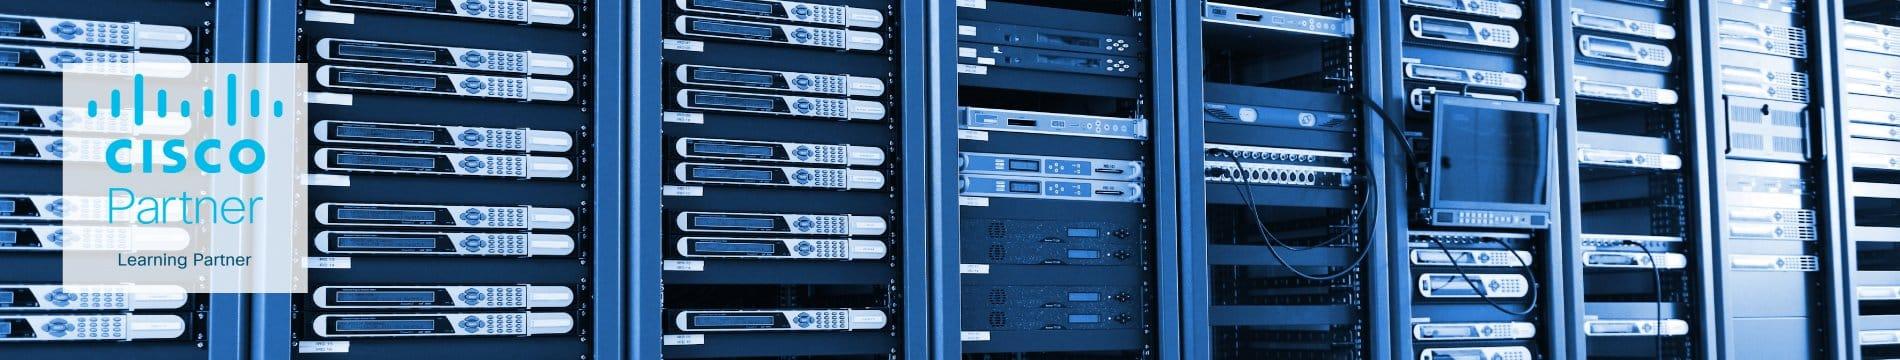 Cisco CCNA Datacenter, Cisco CCNP Datacenter, CCNA CLoud, CCNP Cloud